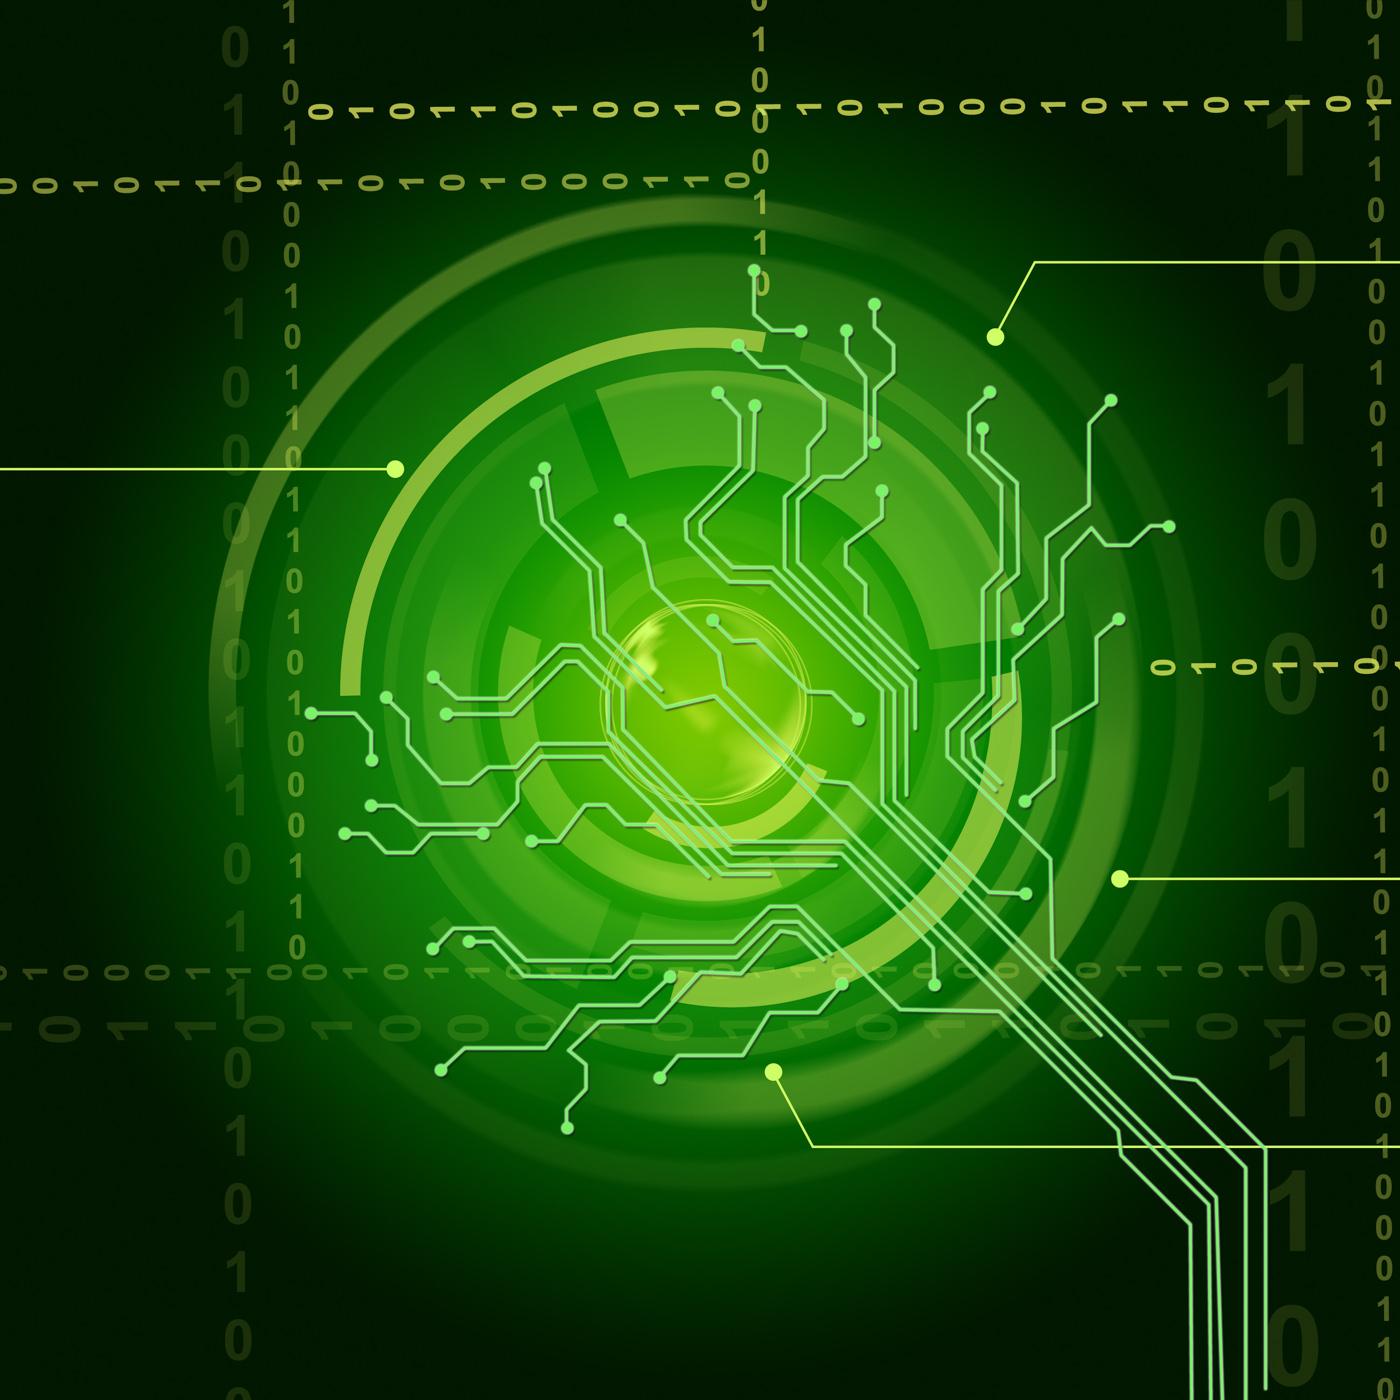 Free photo: Electronic Sensor Background Shows Illuminated Eye Sensor Or  Circuit - Art, Illumination, Technology - Free Download - Jooinn